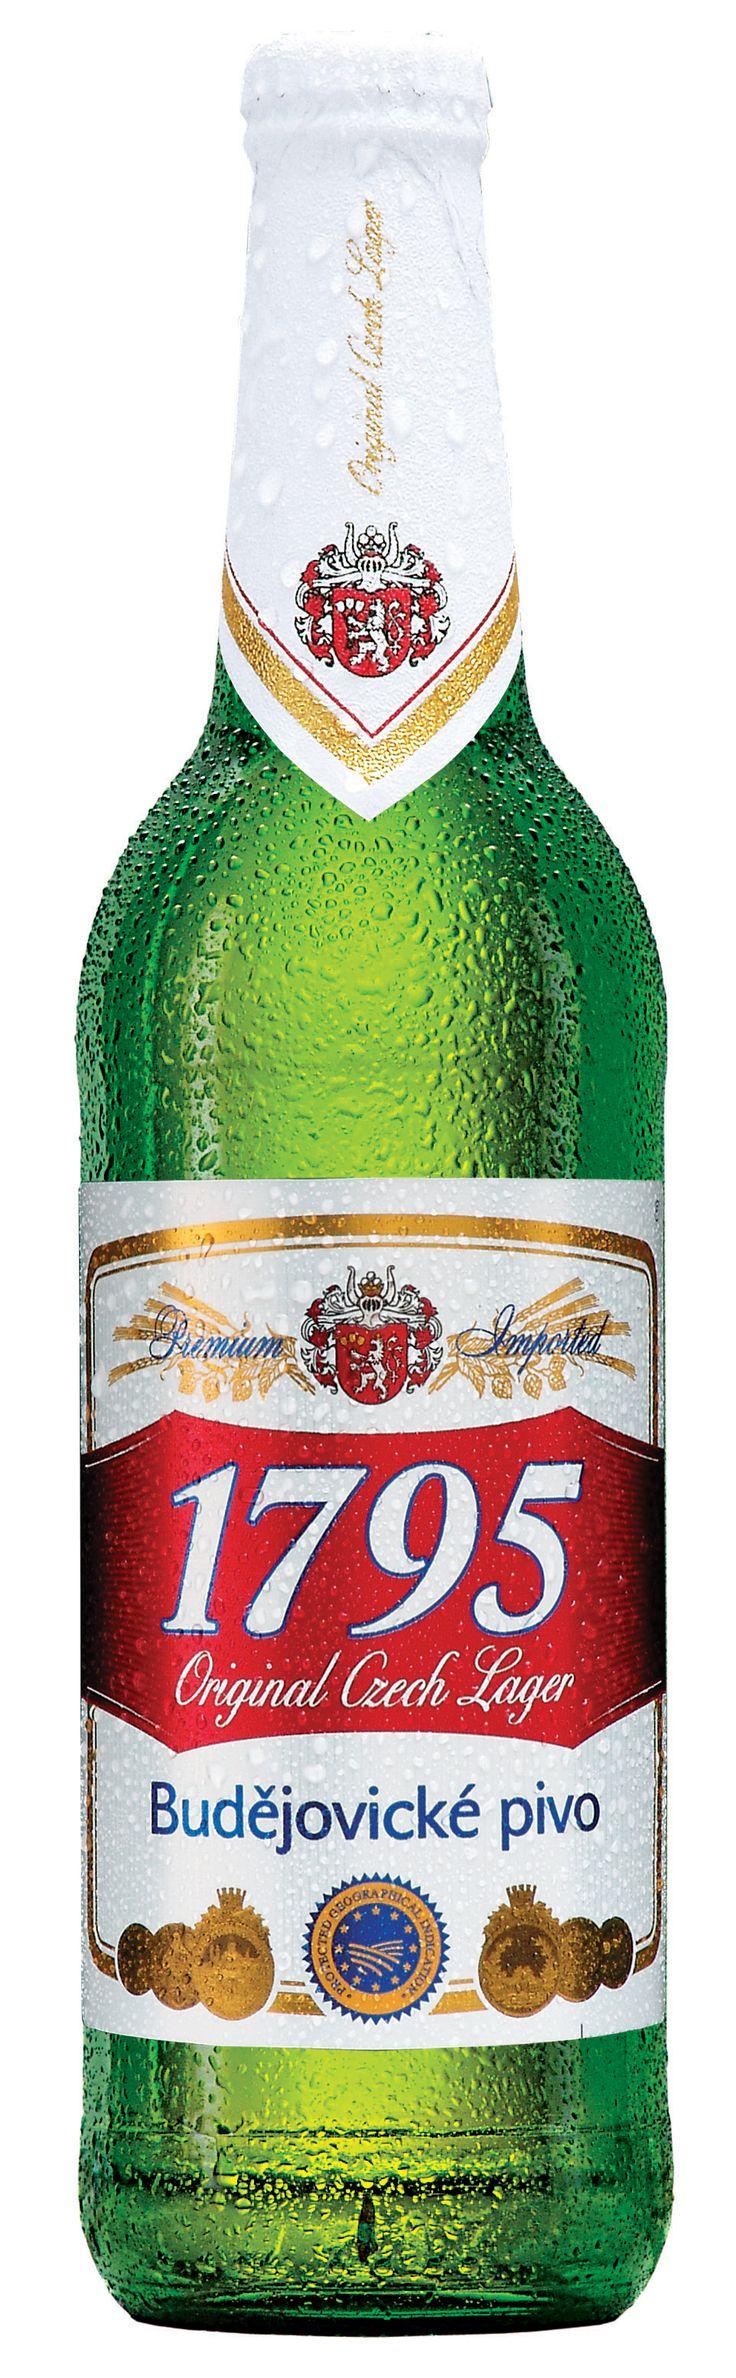 1795 Budejovické Pivo - Czech Republic http://bo.darek.cz/obchod_pic/nahledy/ceskyvyber.jpg-thumb-800x0-ifbigger.jpg